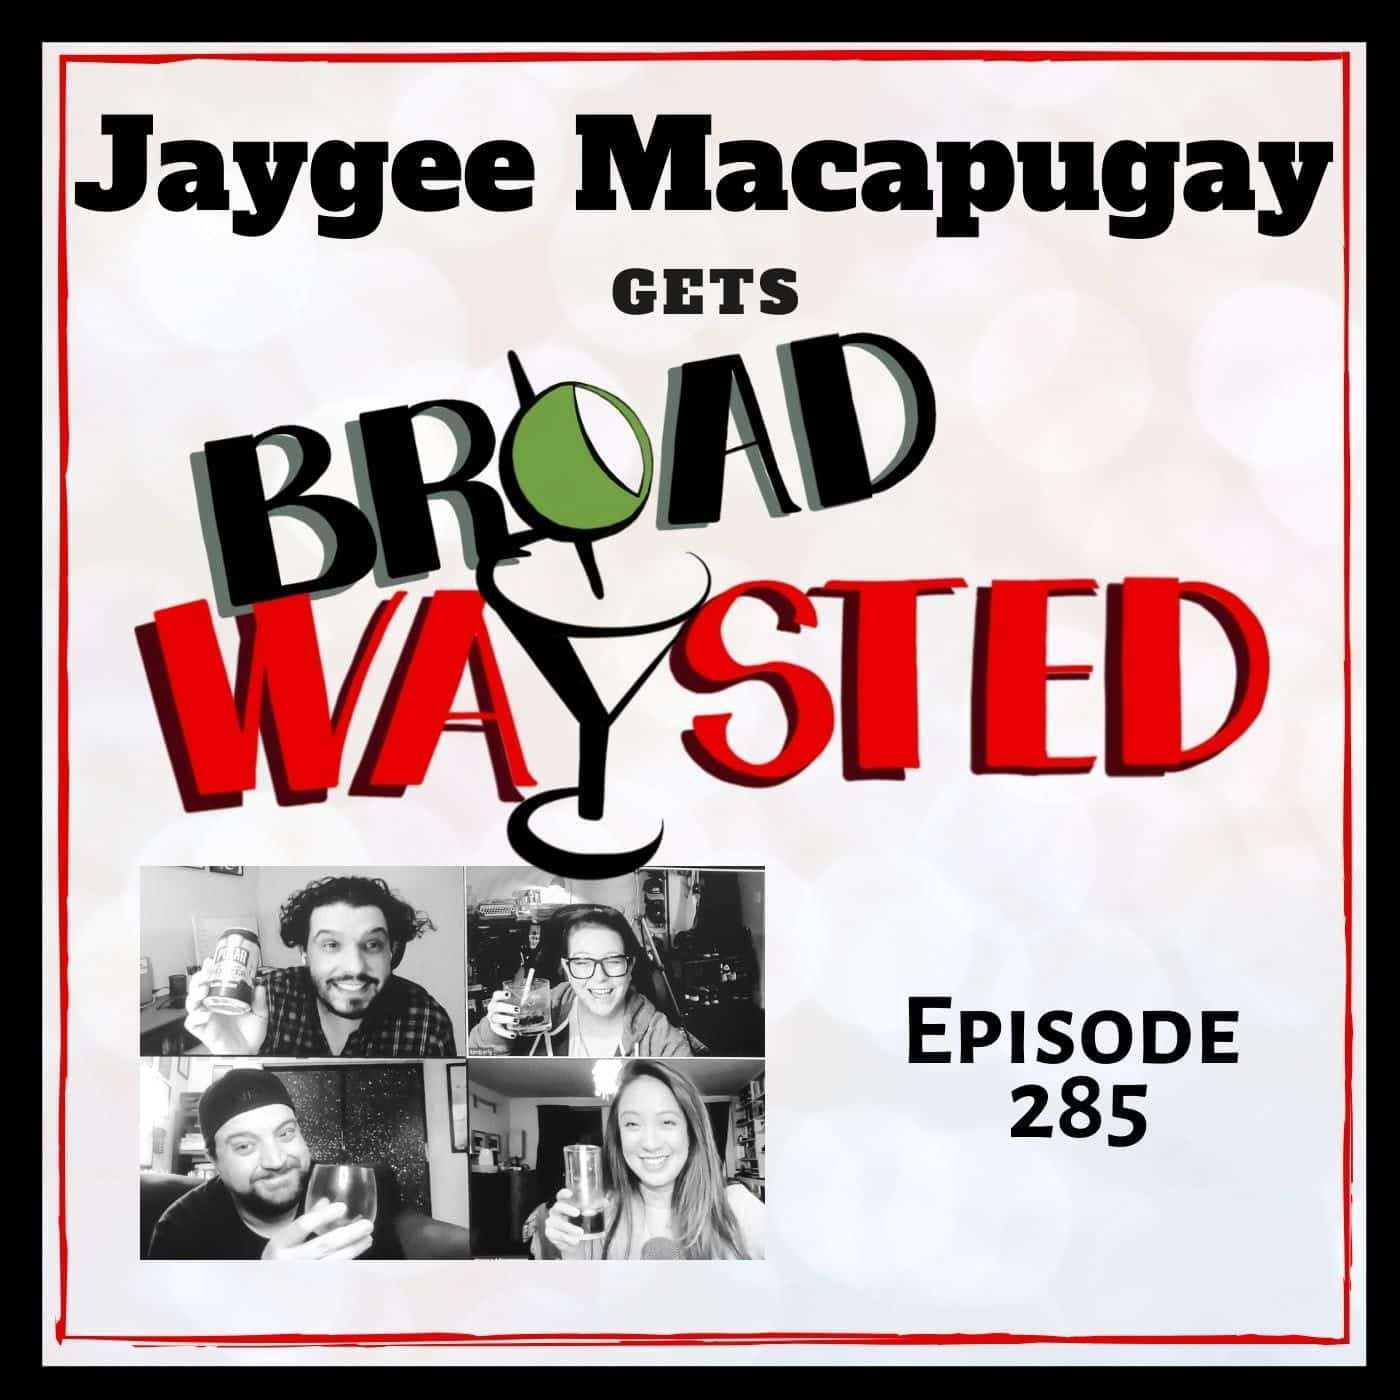 Episode 285: Jaygee Macapugay gets Broadwaysted!